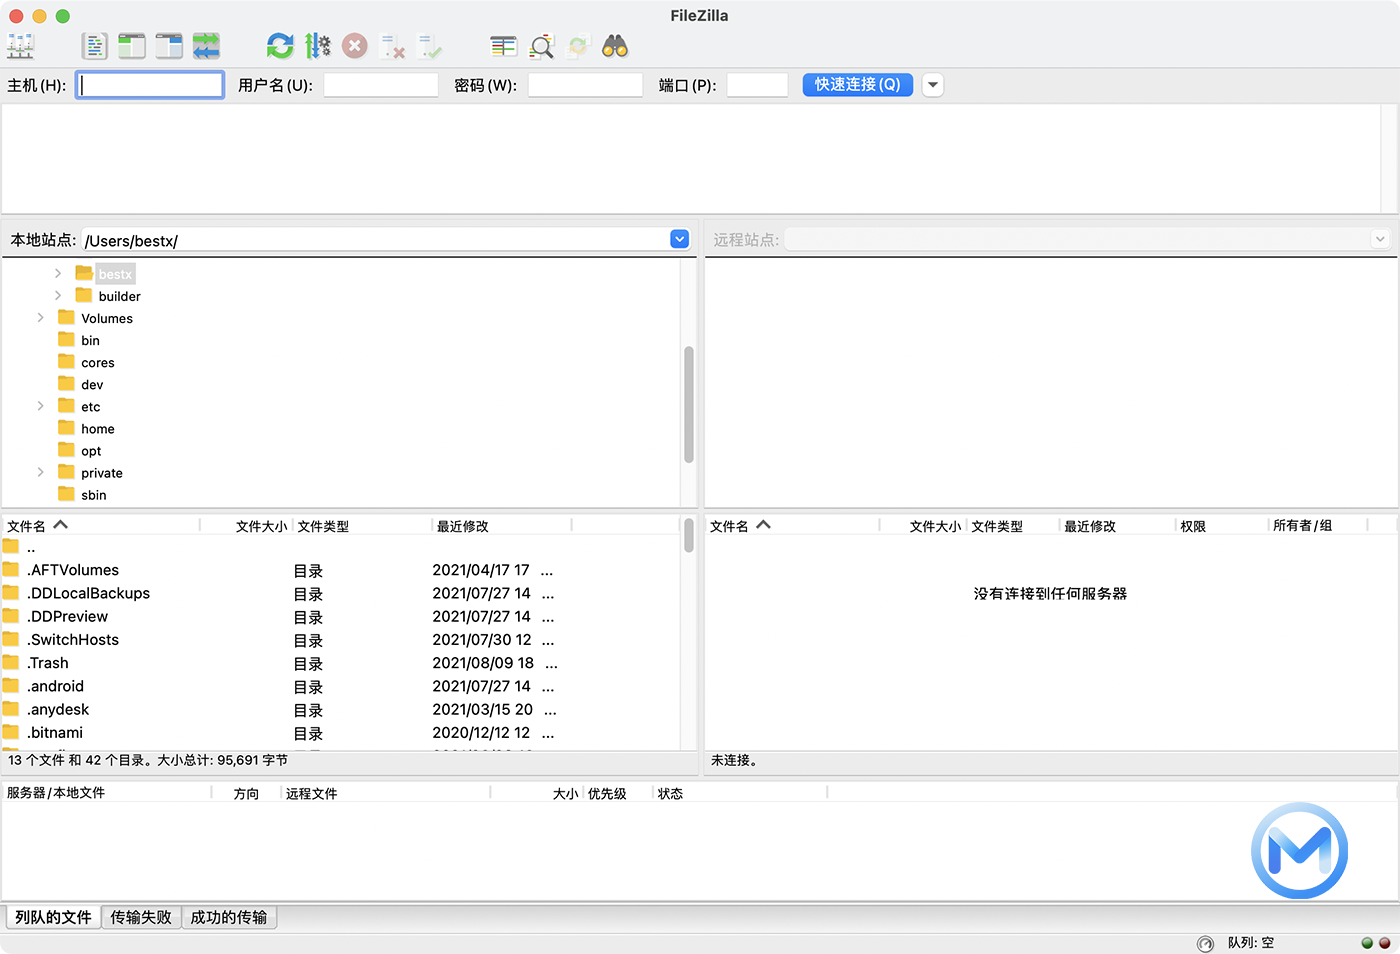 FileZilla For Mac v3.54.1 免费开源的FTP管理软件中文版